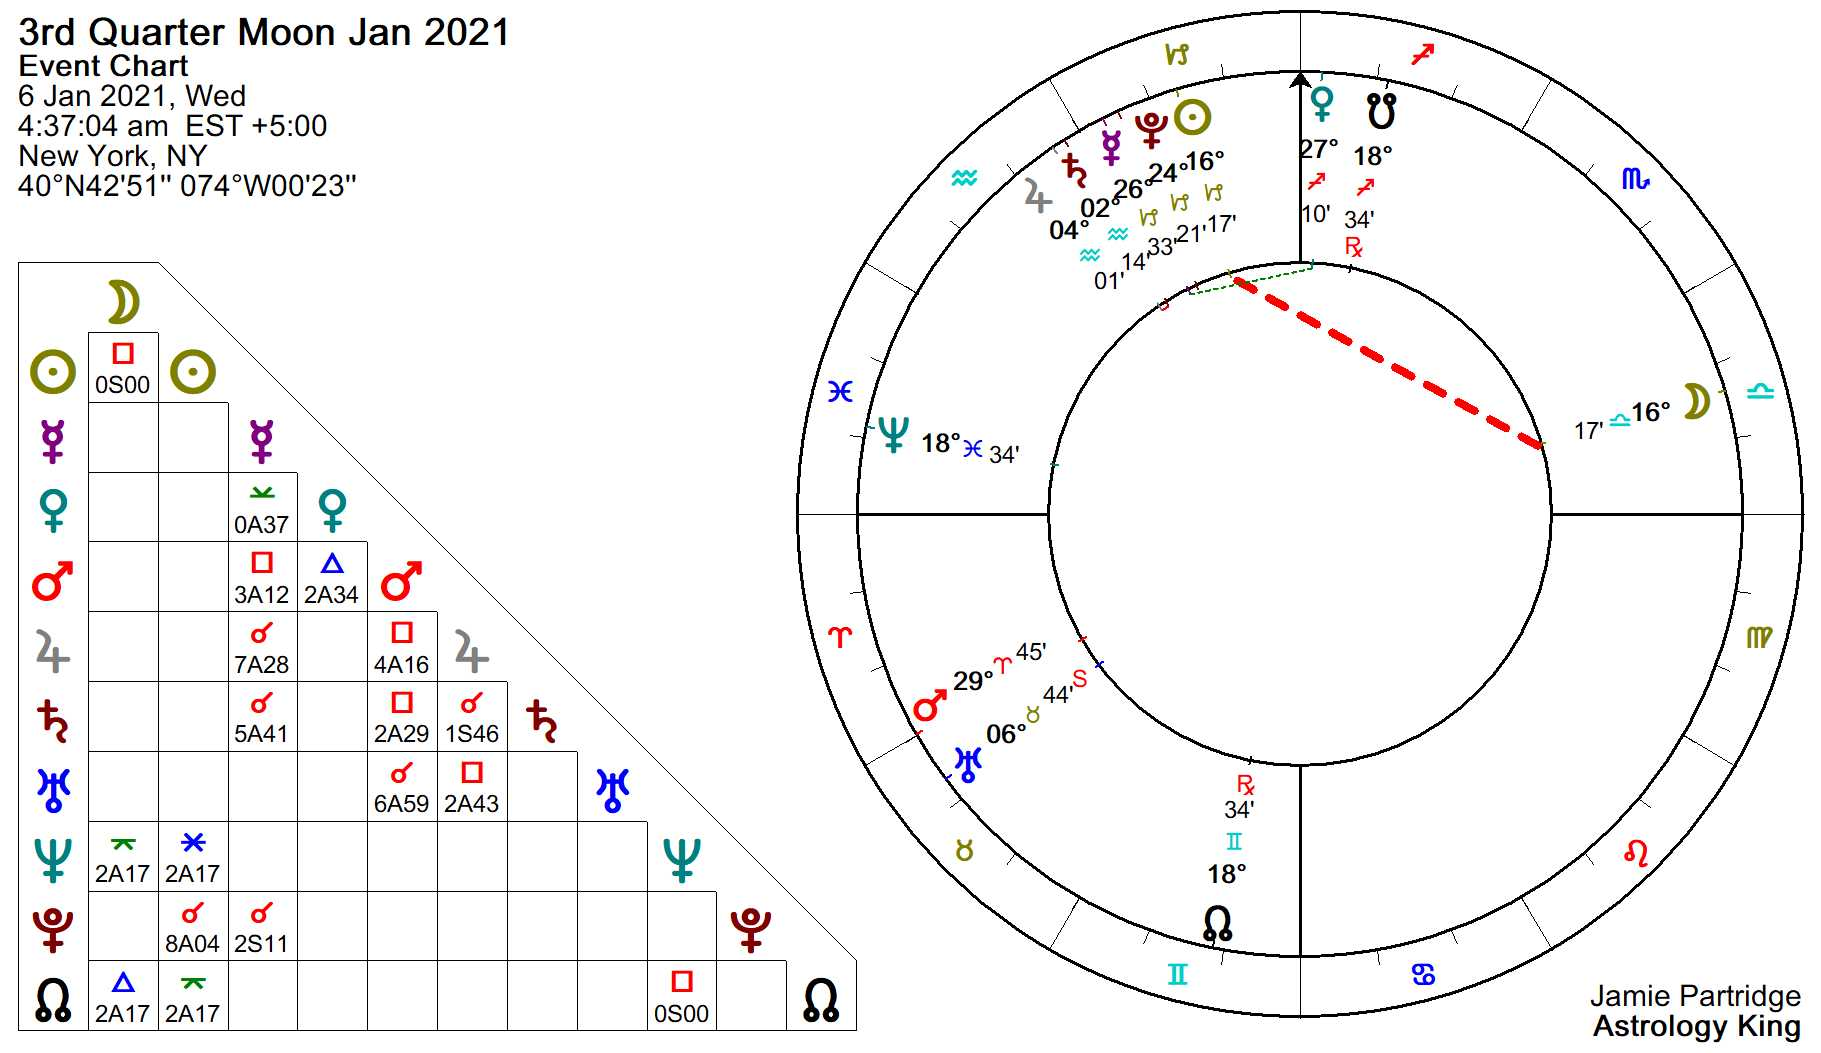 Horoscope Feb 12 2021